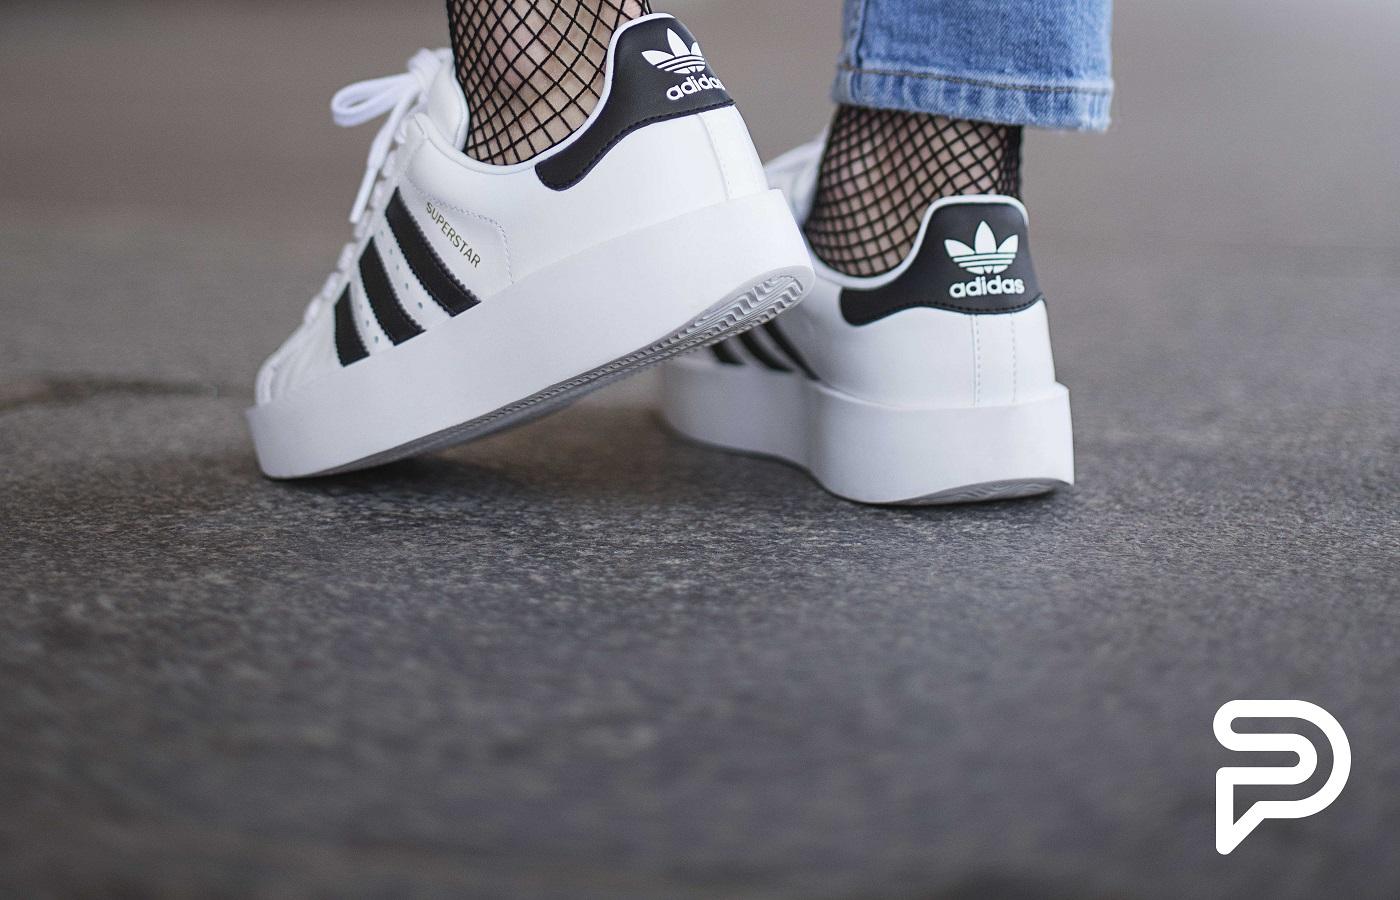 Adidas Originals Shoe Sneakers Adidas Superstar stadium